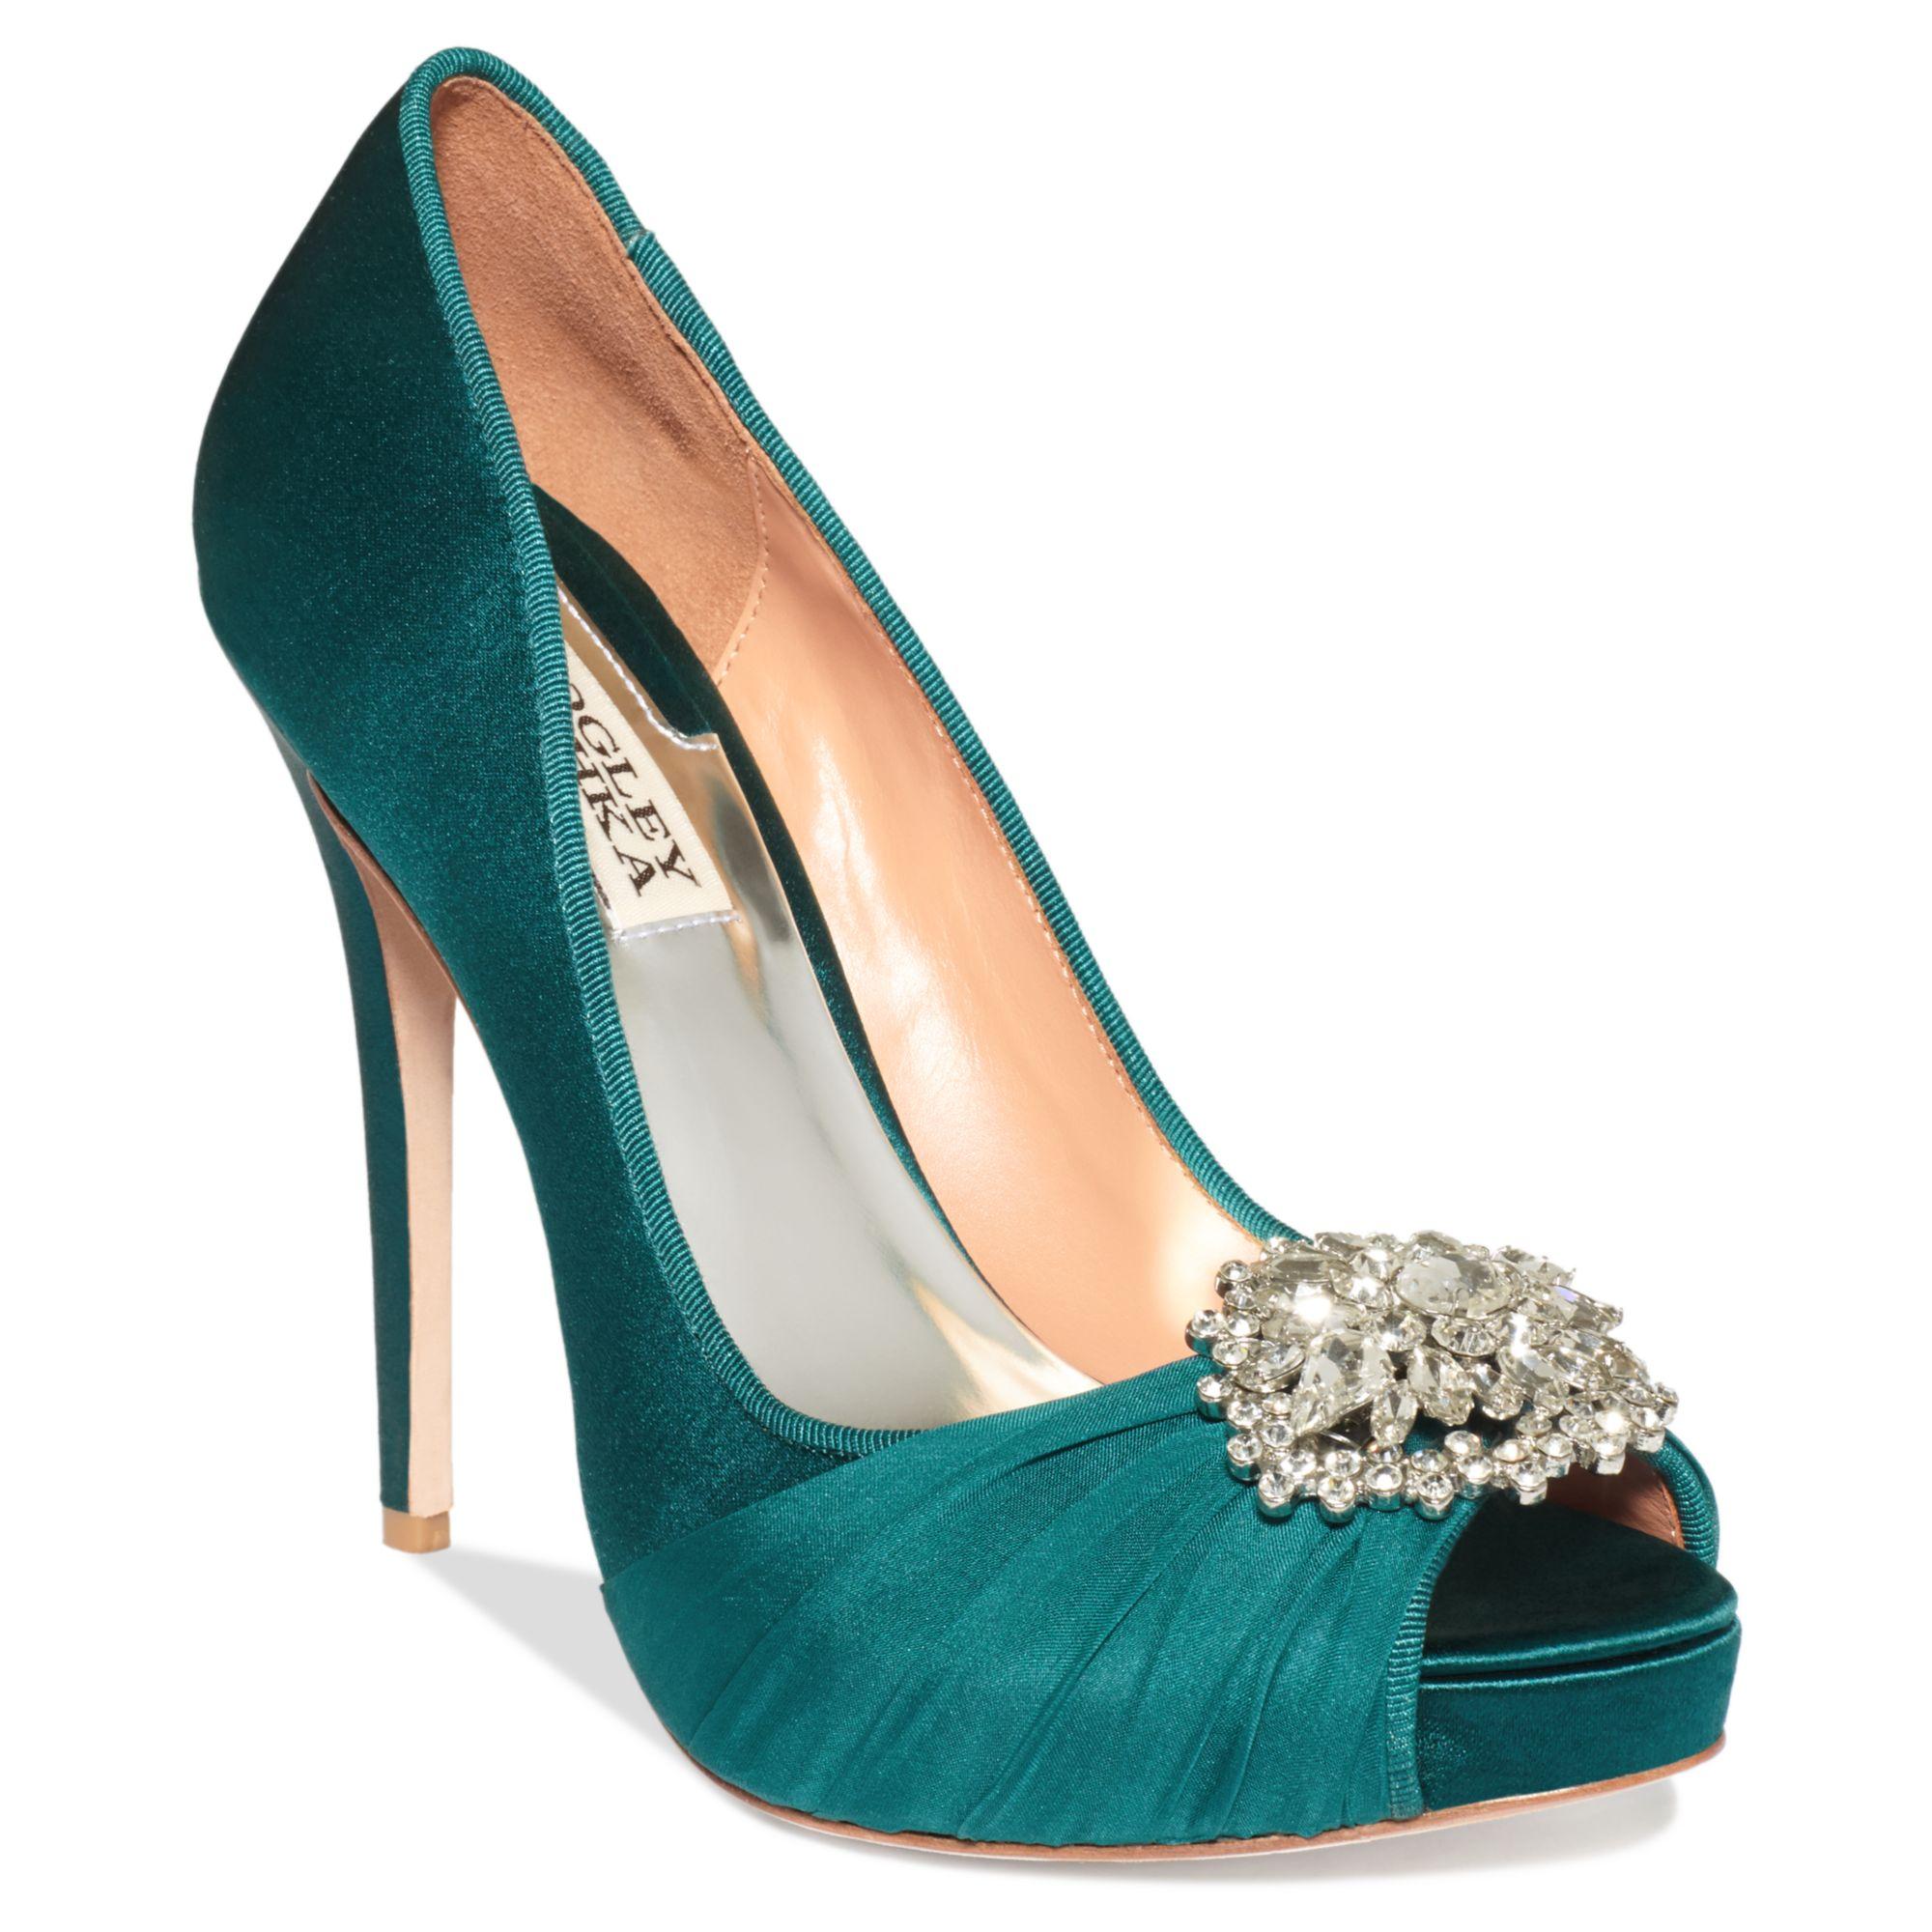 Teal Blue Satin Shoes